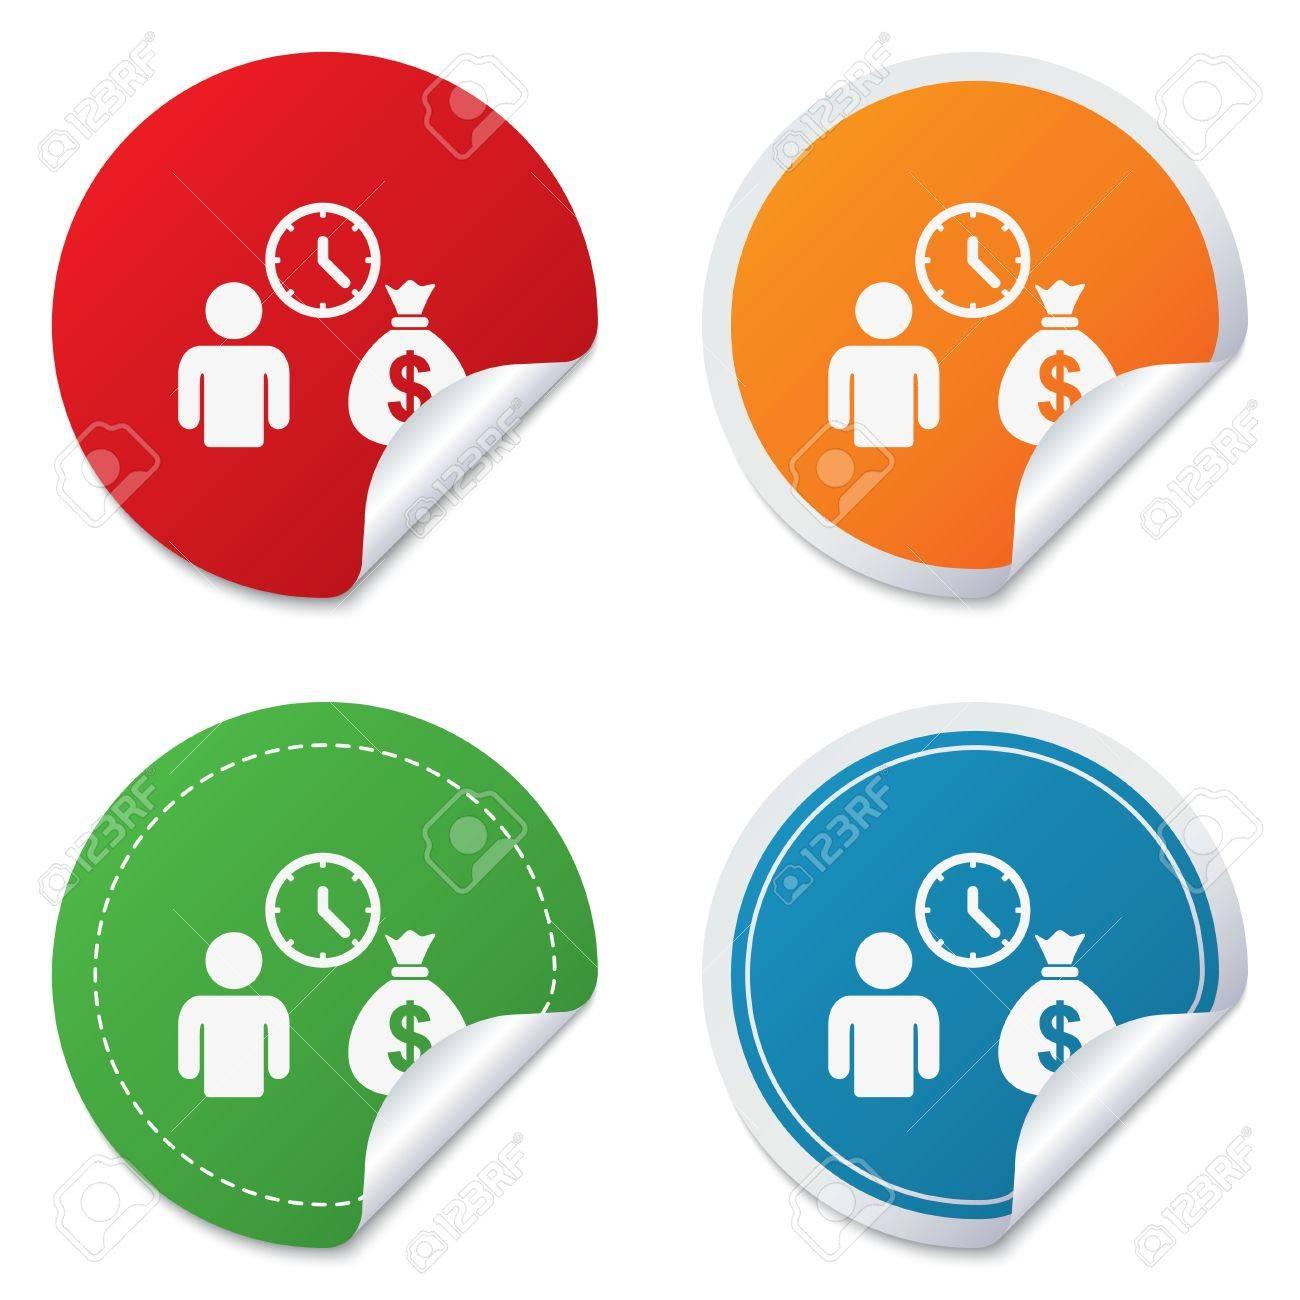 Making Money Icons Make Money Way Online to rf